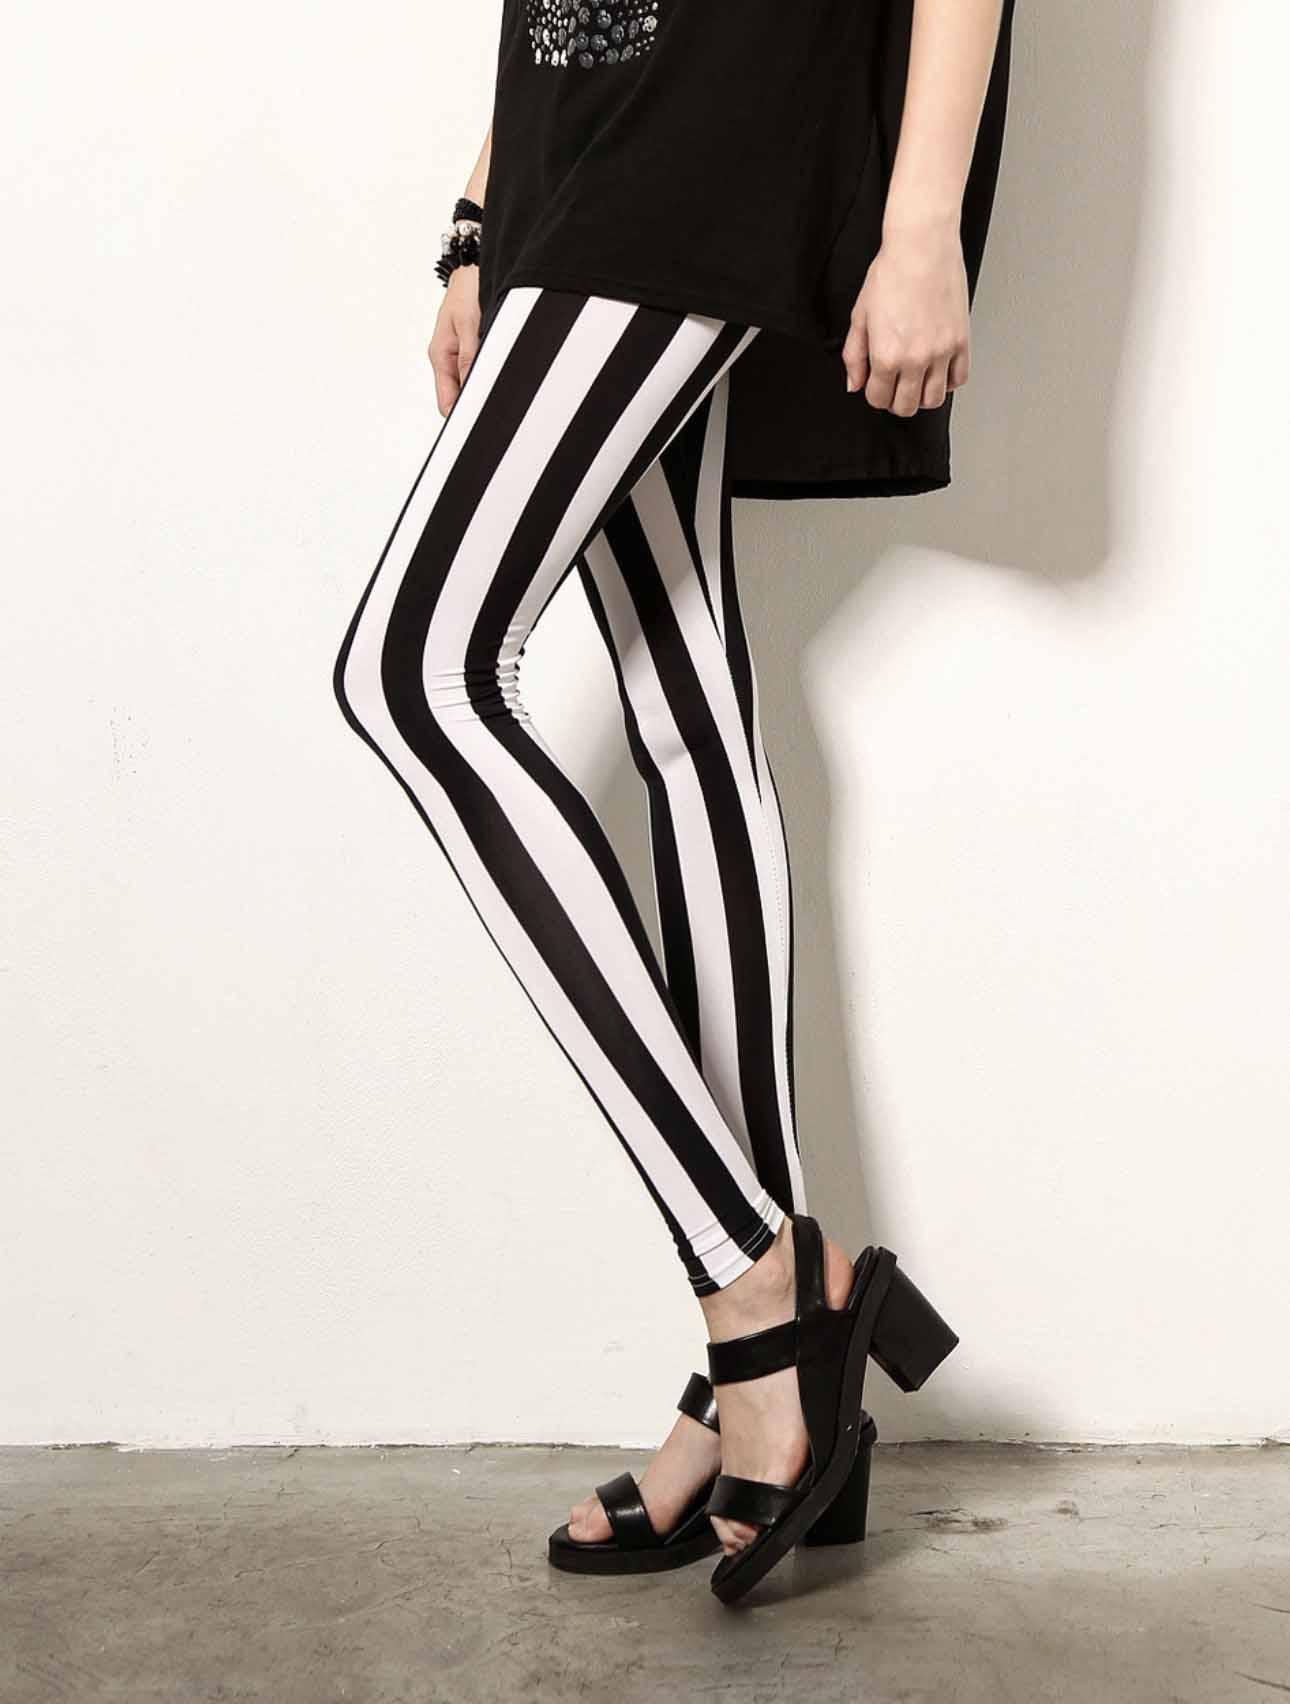 New Black White Striped Vertical Printed   Leggings   Gothic Creative Fitness Women Punk Shape Slim Sexy Popular Pants Drop shipping